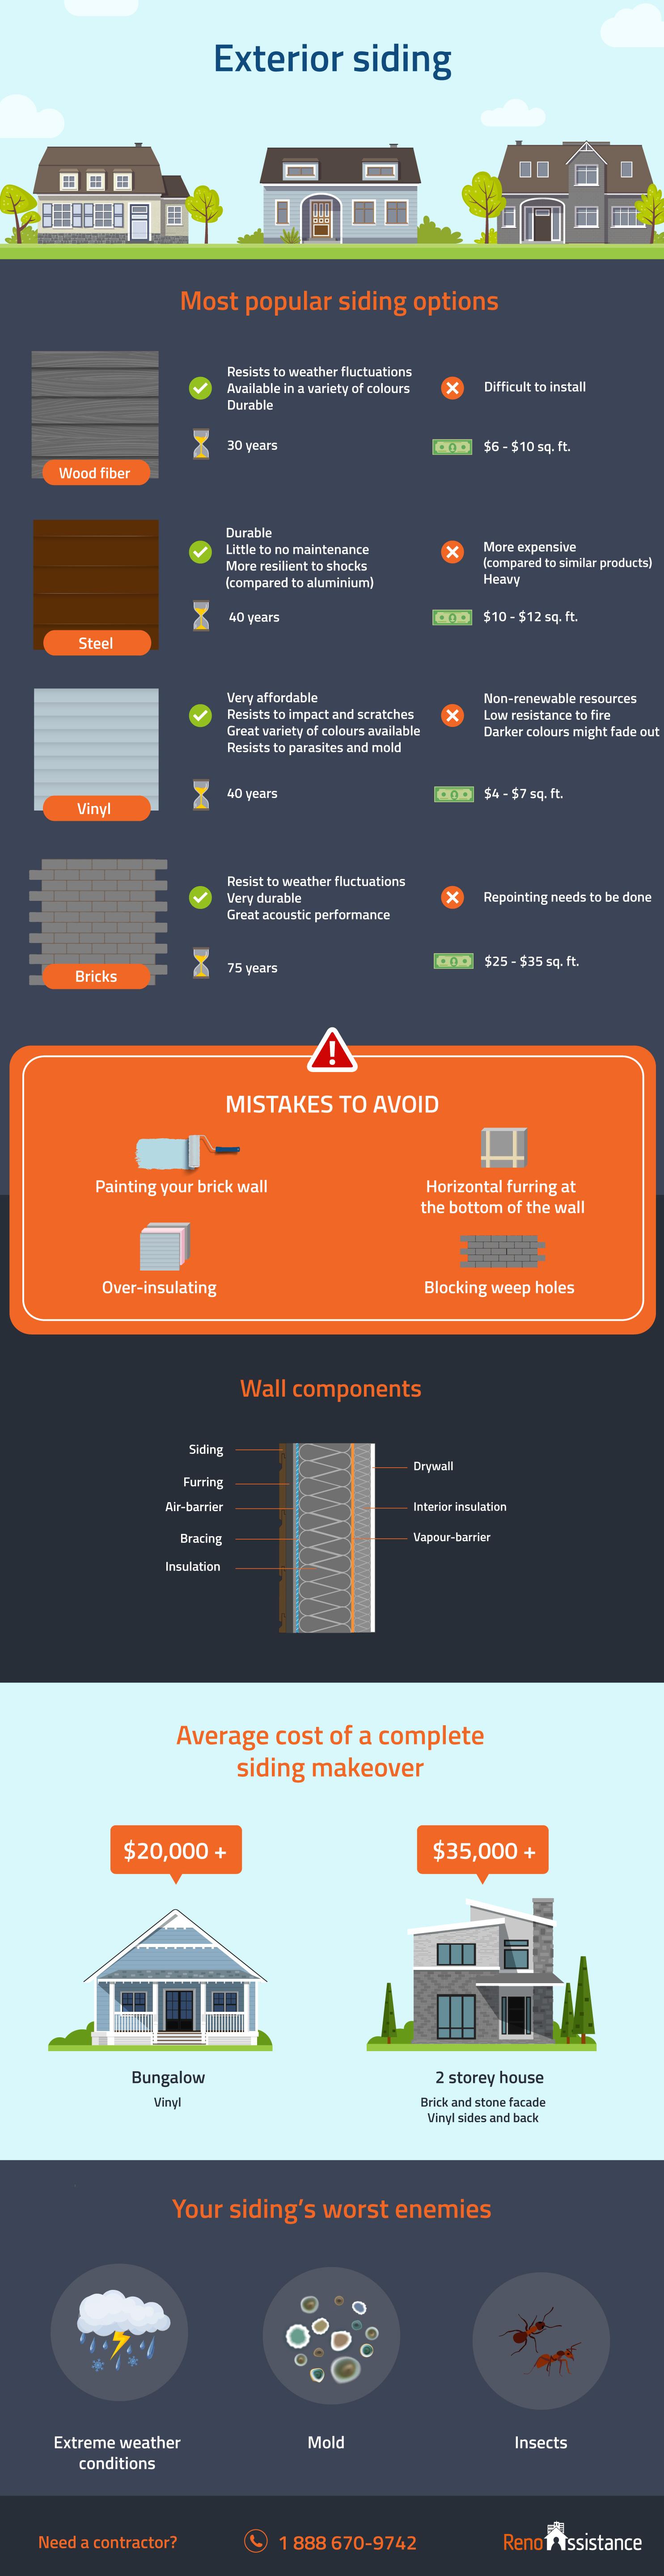 exterior-siding-infographic